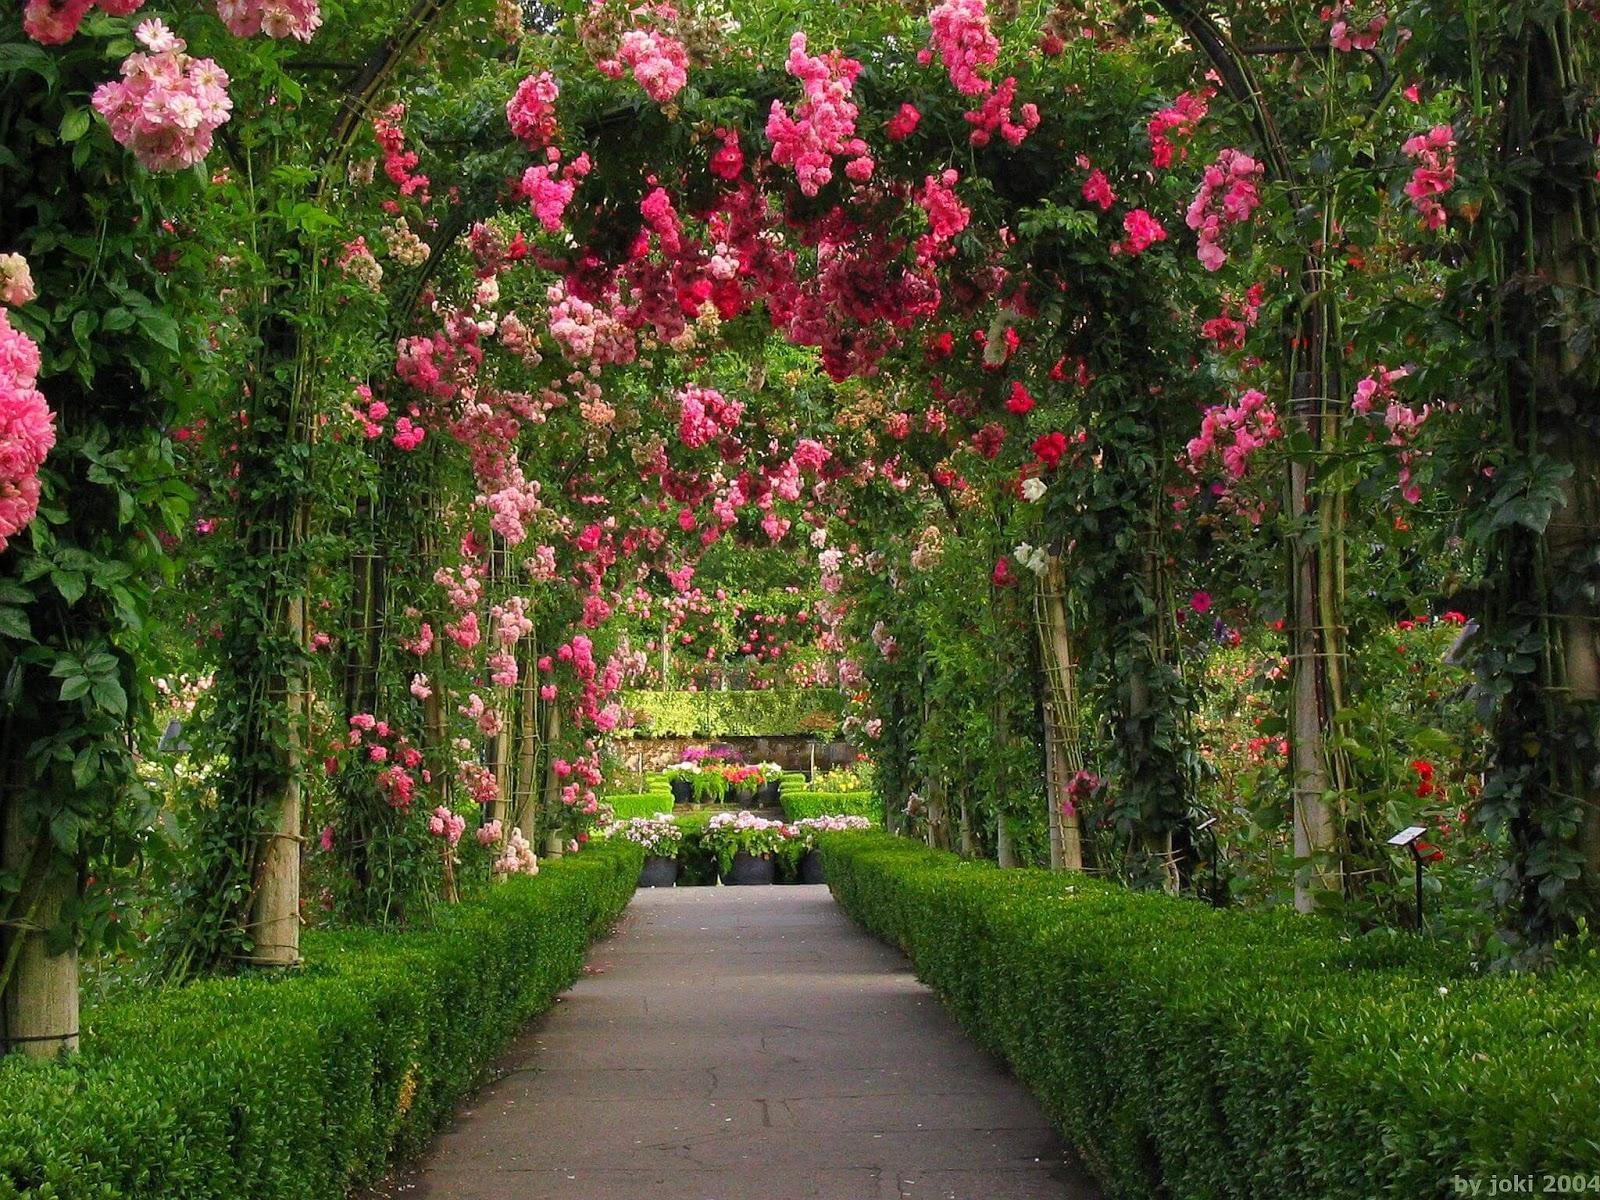 Wallpaper download garden - Download Garden Wallpaper Big Size